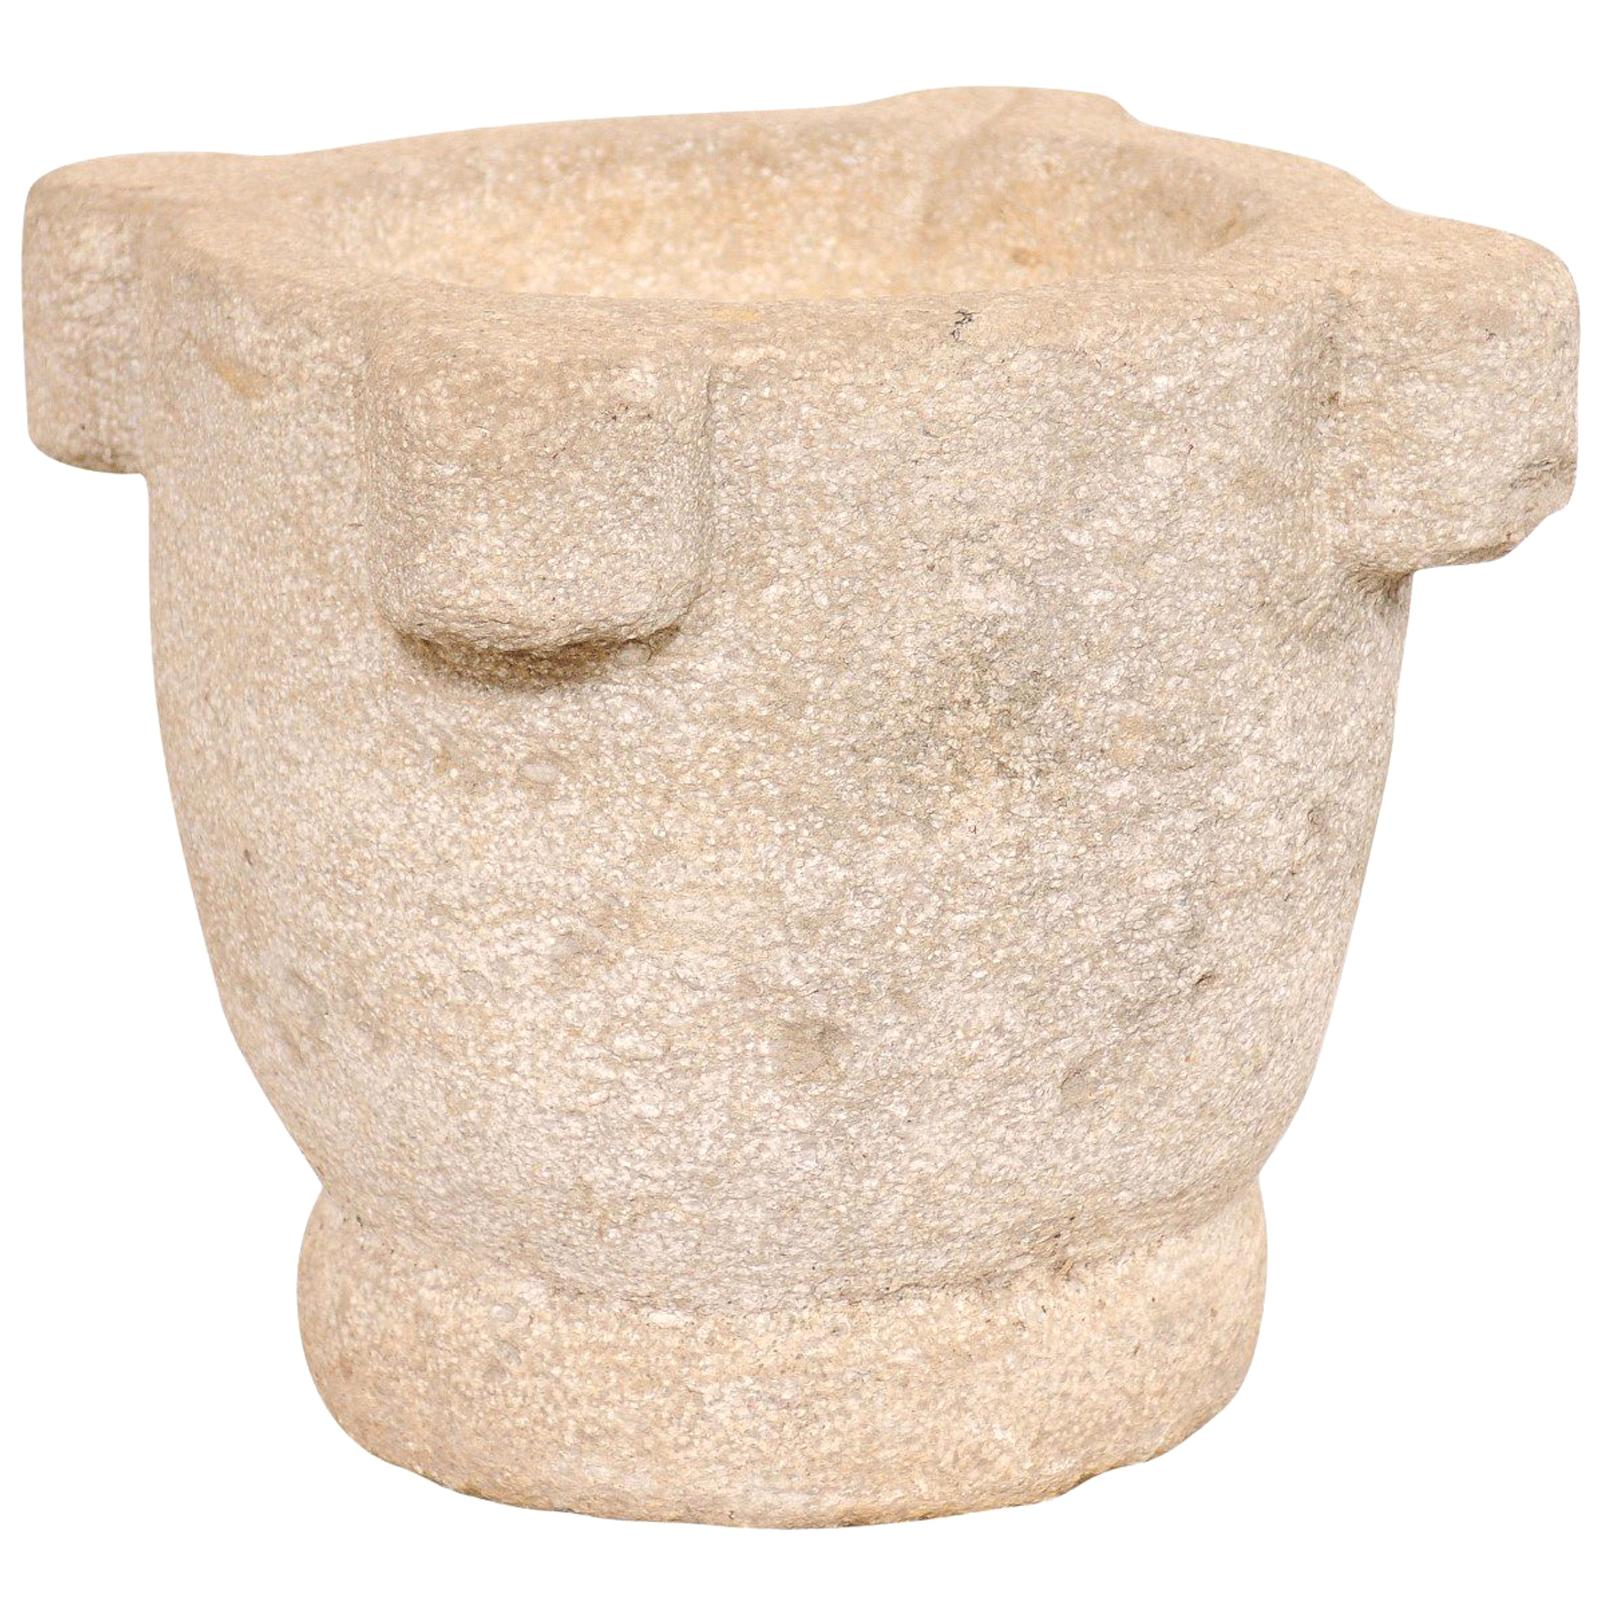 Spanish 18th Century Carved Stone Mortar